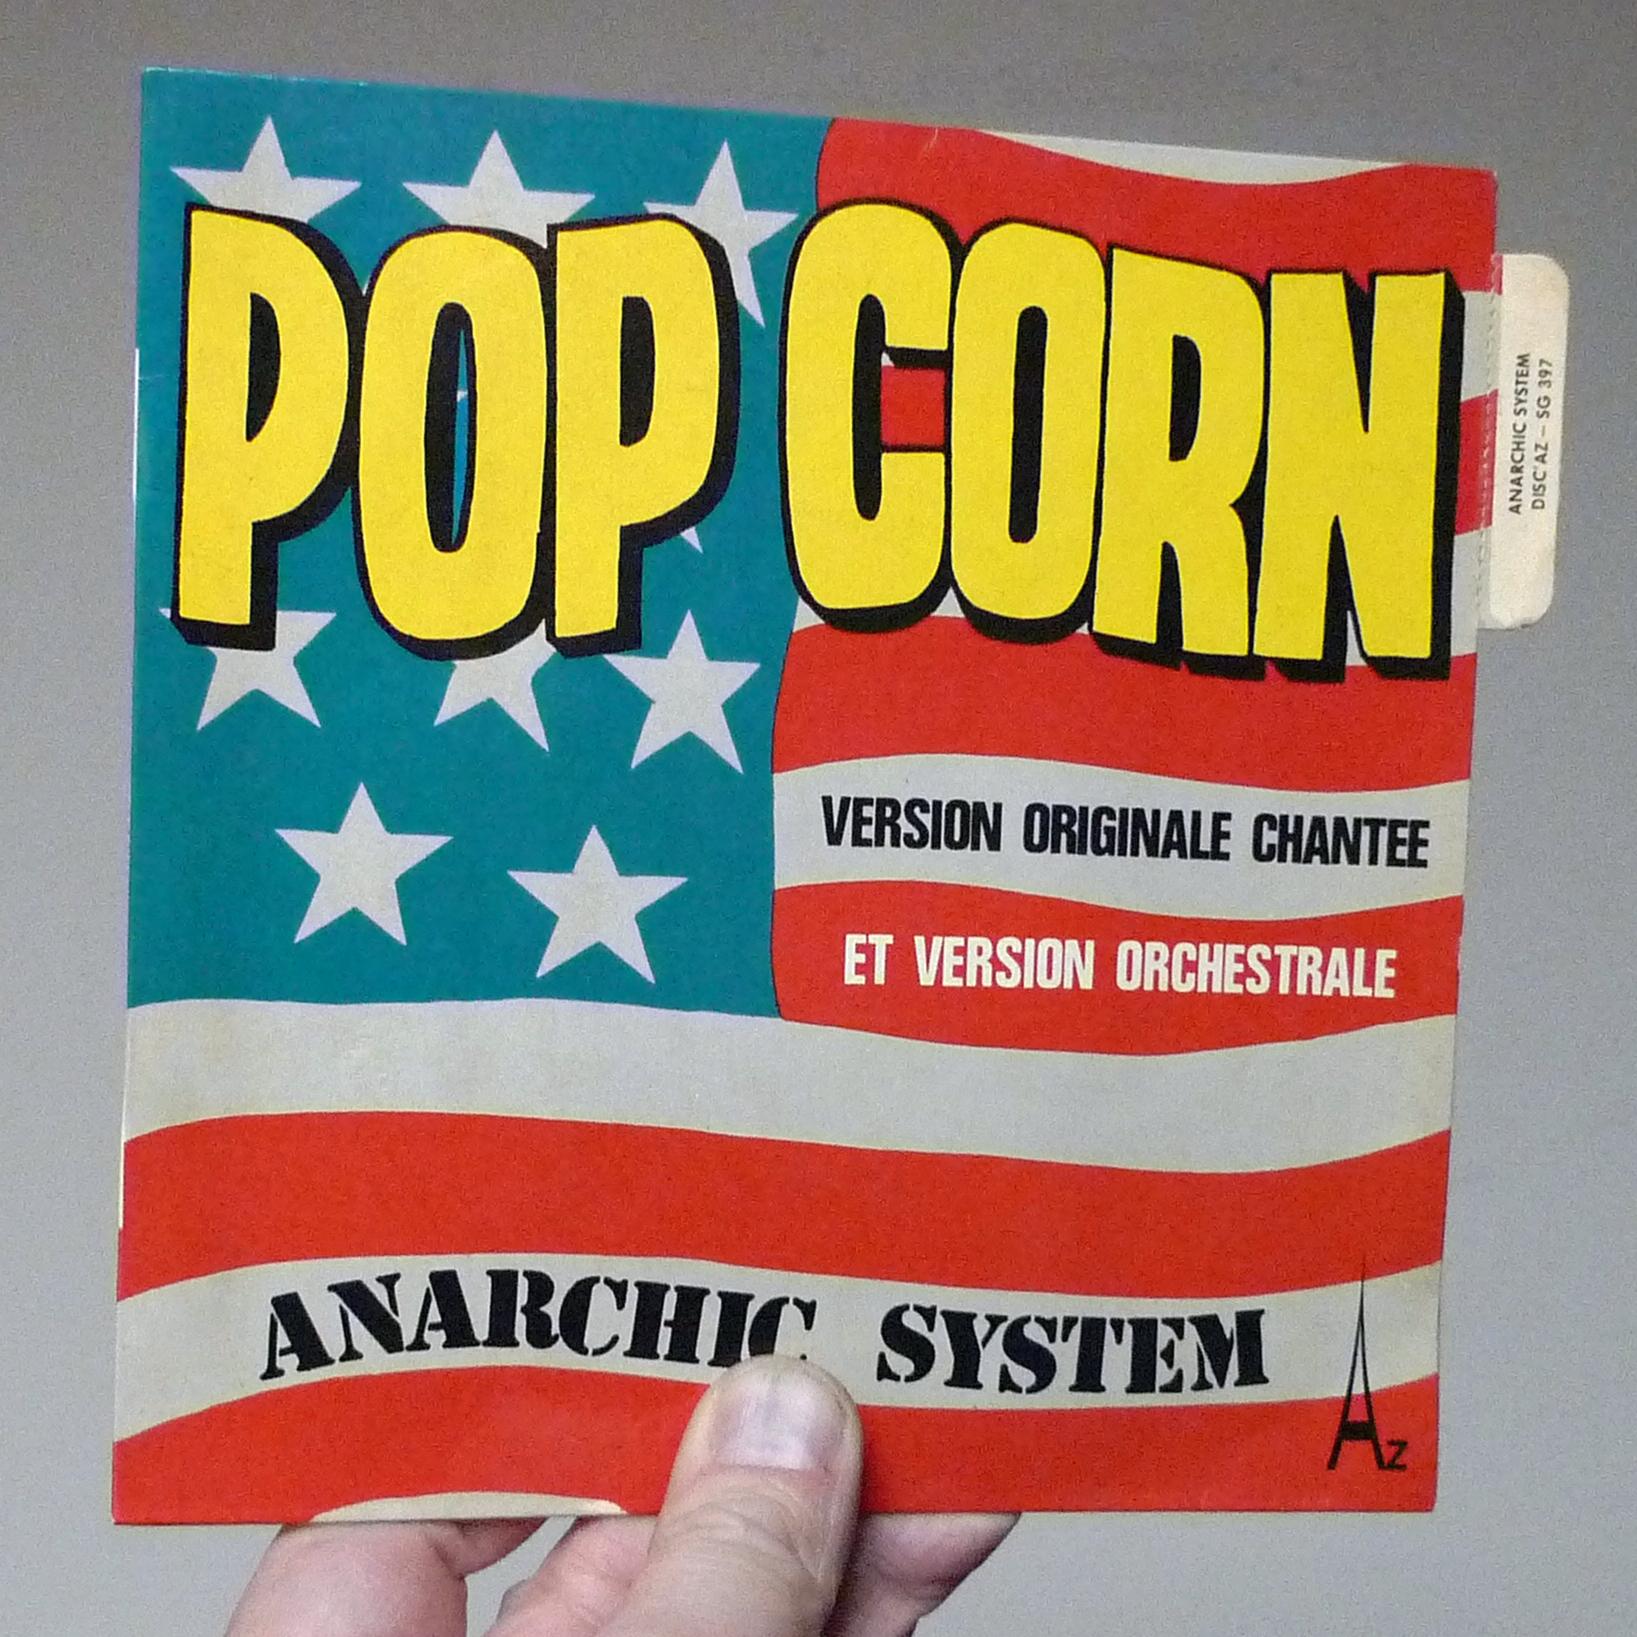 dj50s ep126 sleeve popcorn